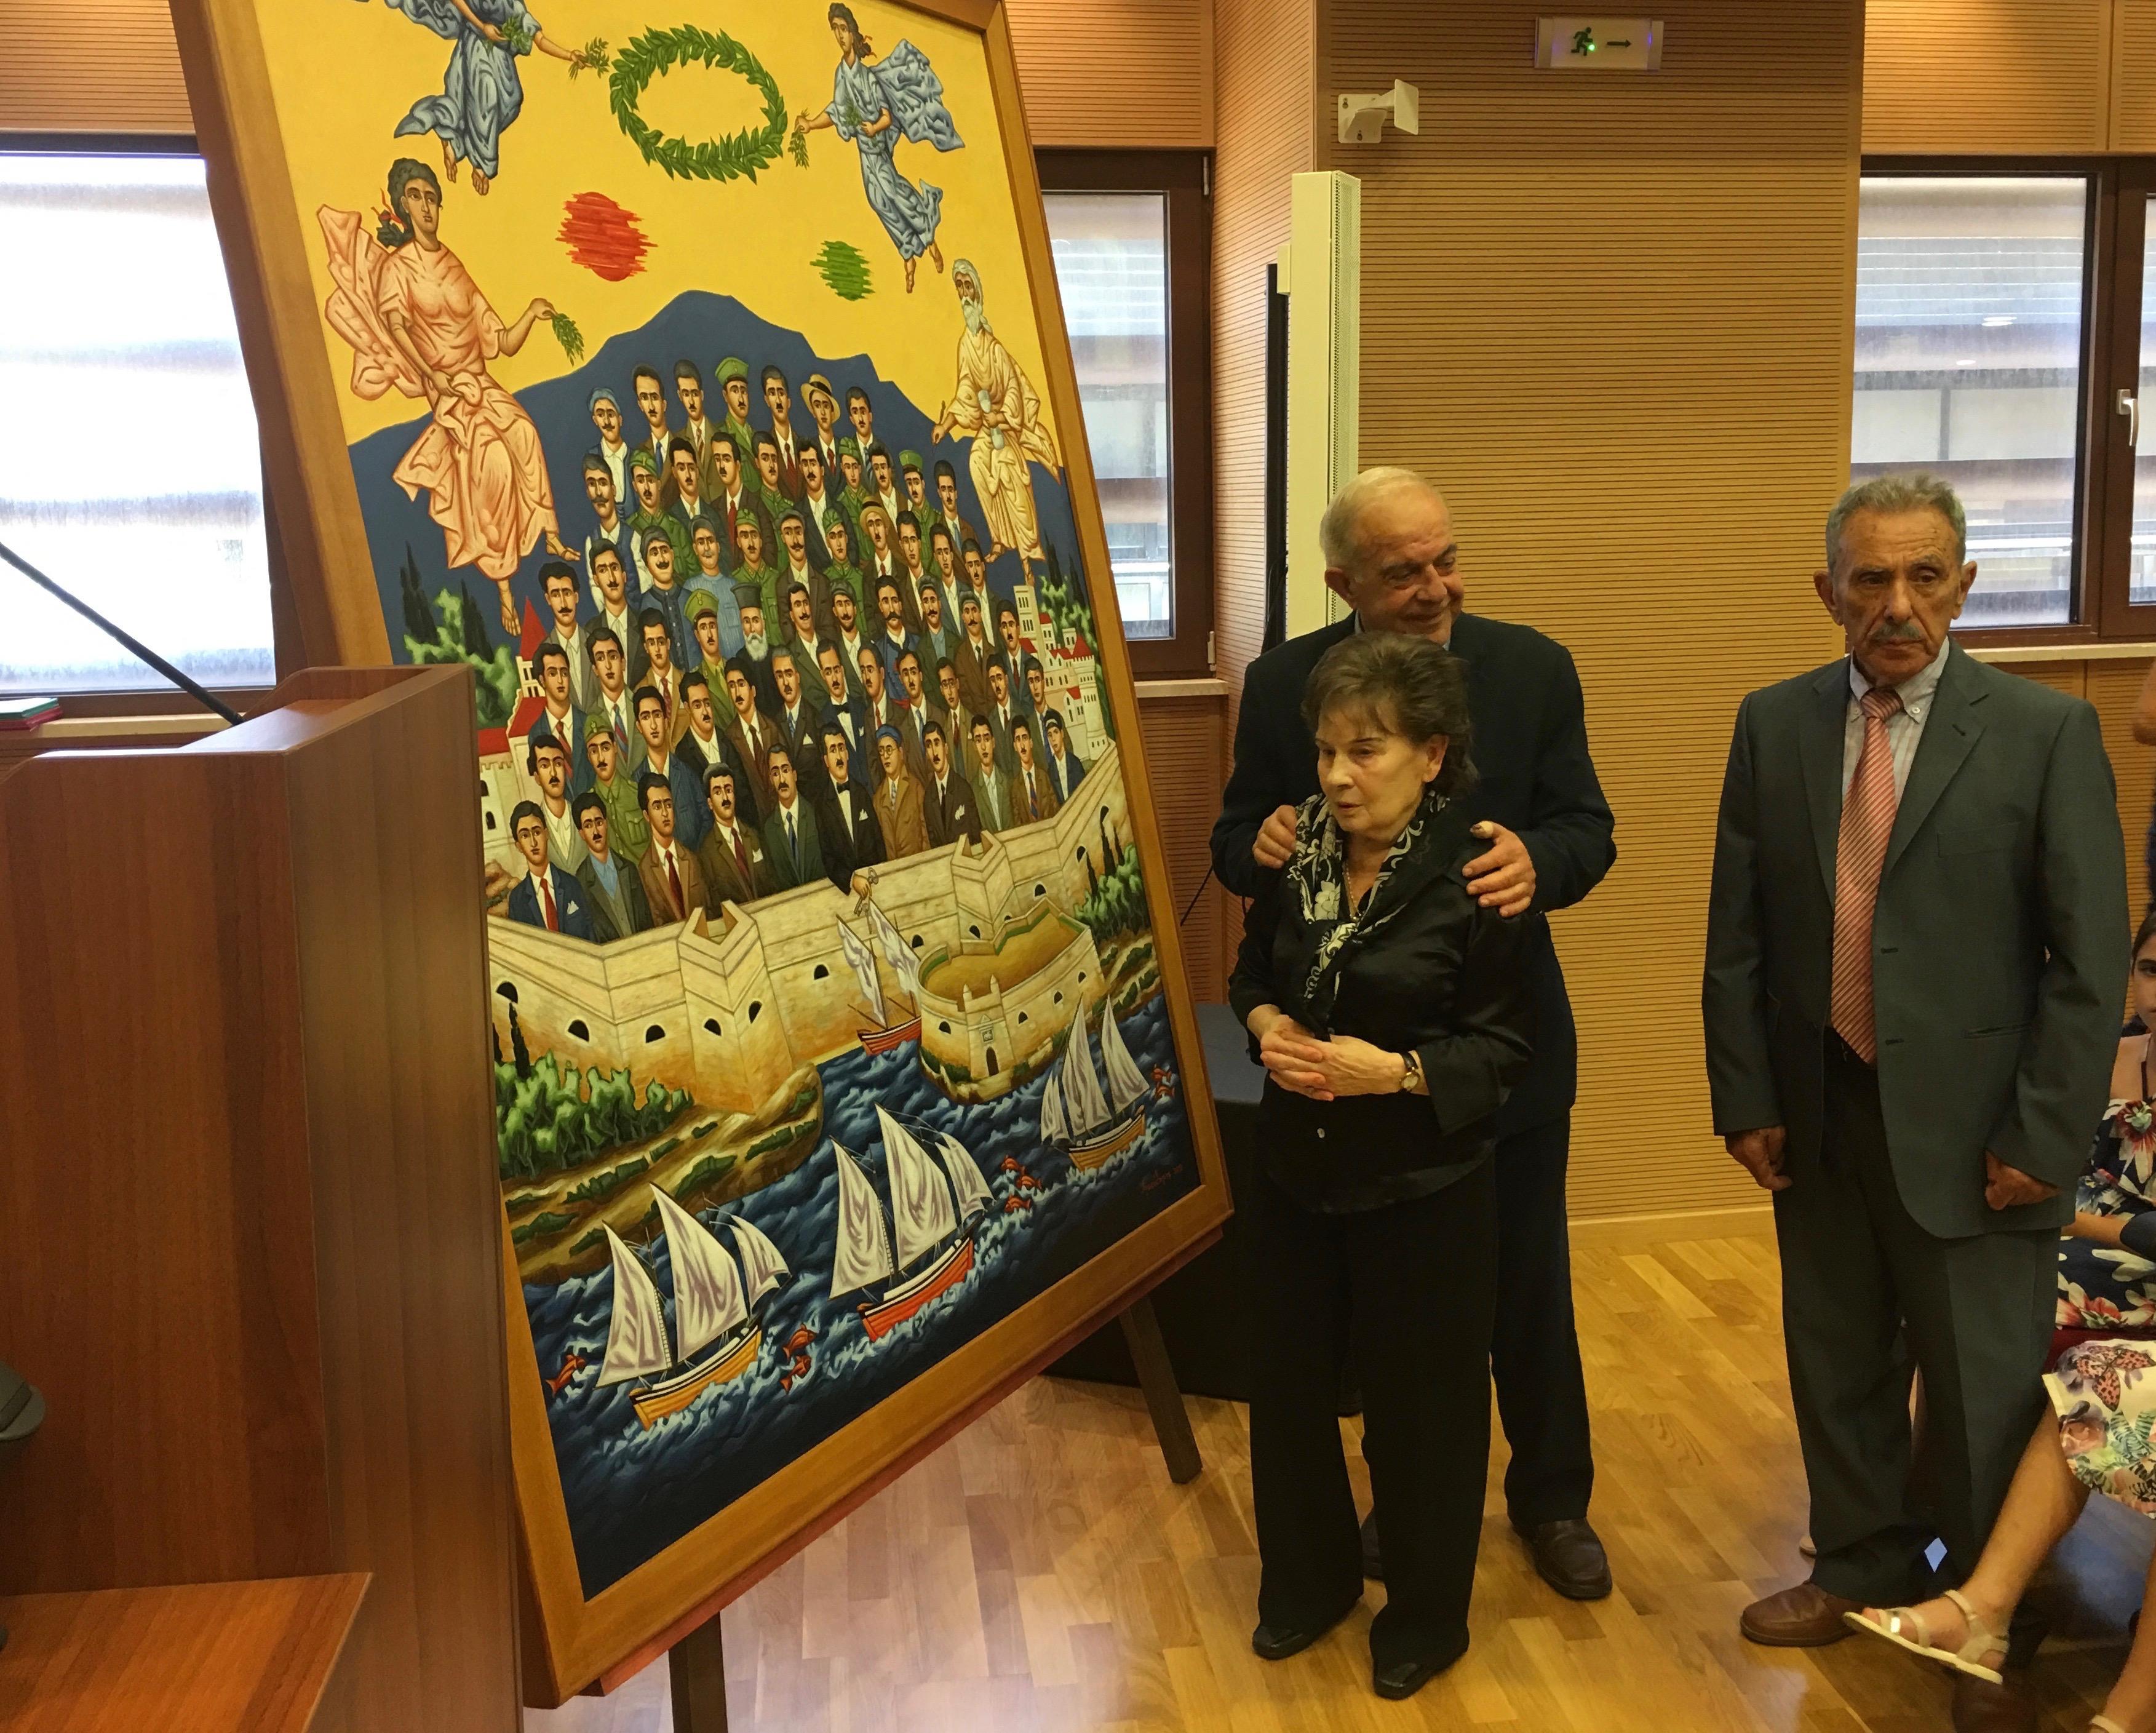 IMG_4847 Συγκίνηση για τον έξοχο πίνακα των 62 Εθνομαρτύρων